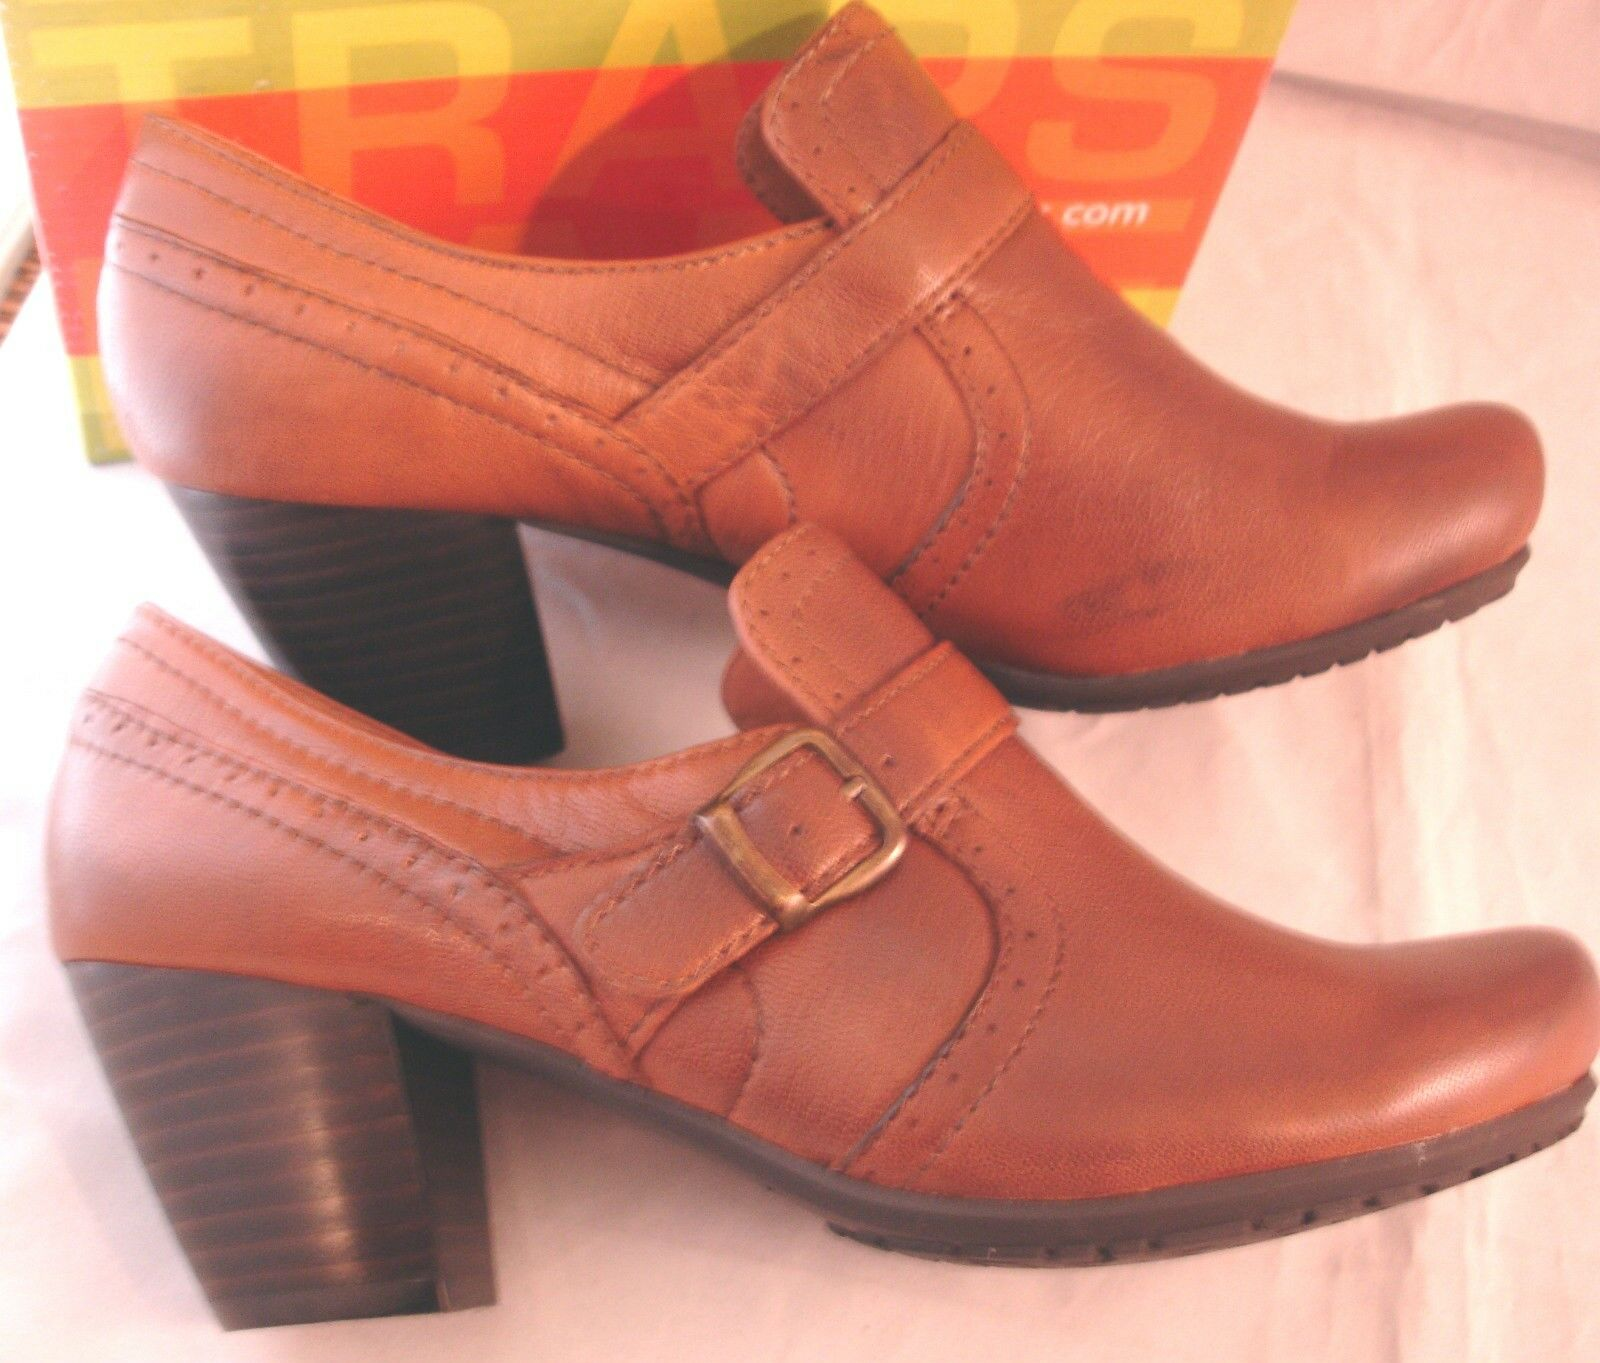 BARETRAPS New New New  Haydon  Brown Leather Shorties Heels Booties Womens Sz 8.5 M NIB 225fa3